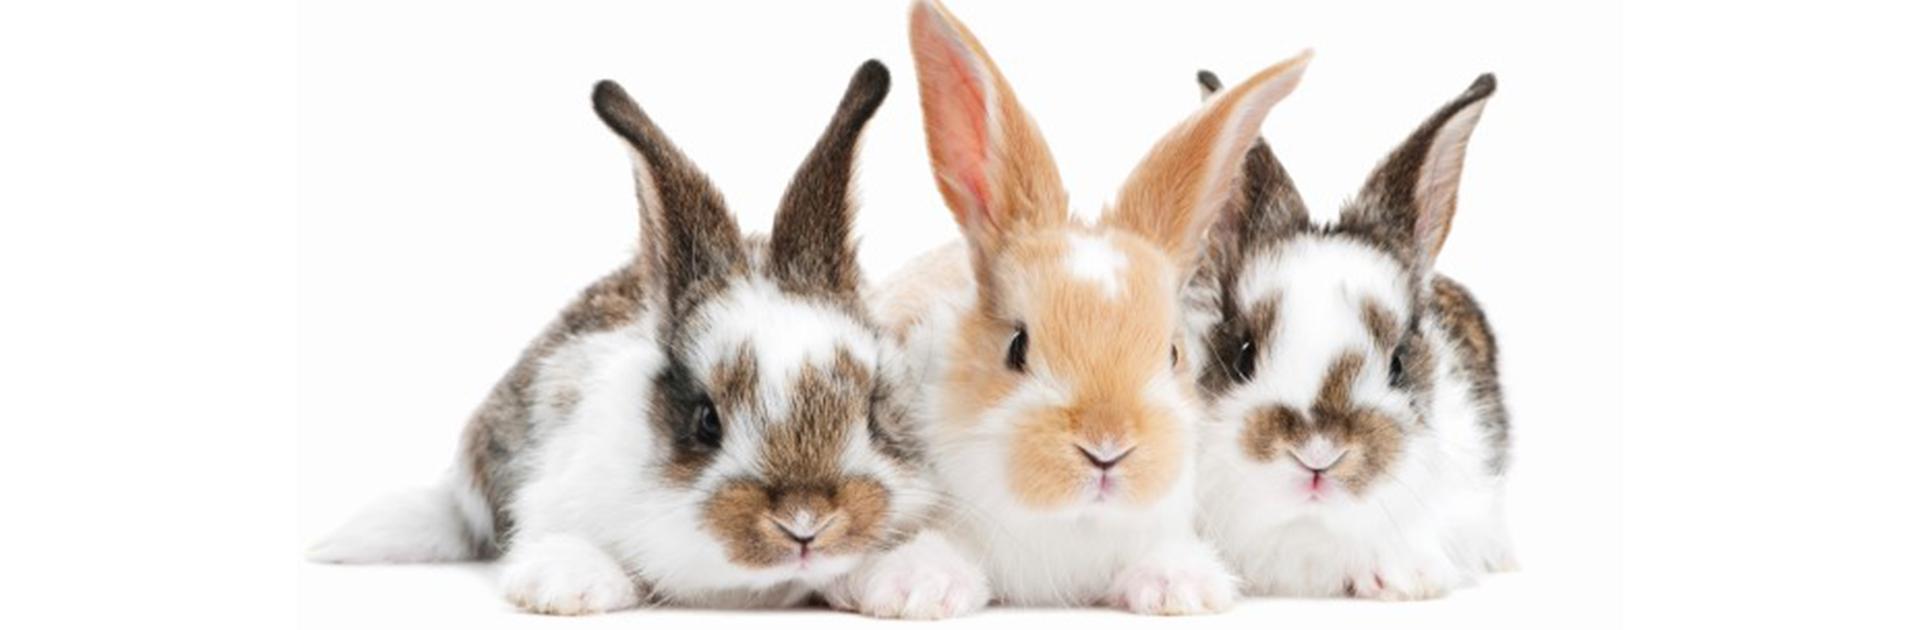 Rabbit banner for MS2